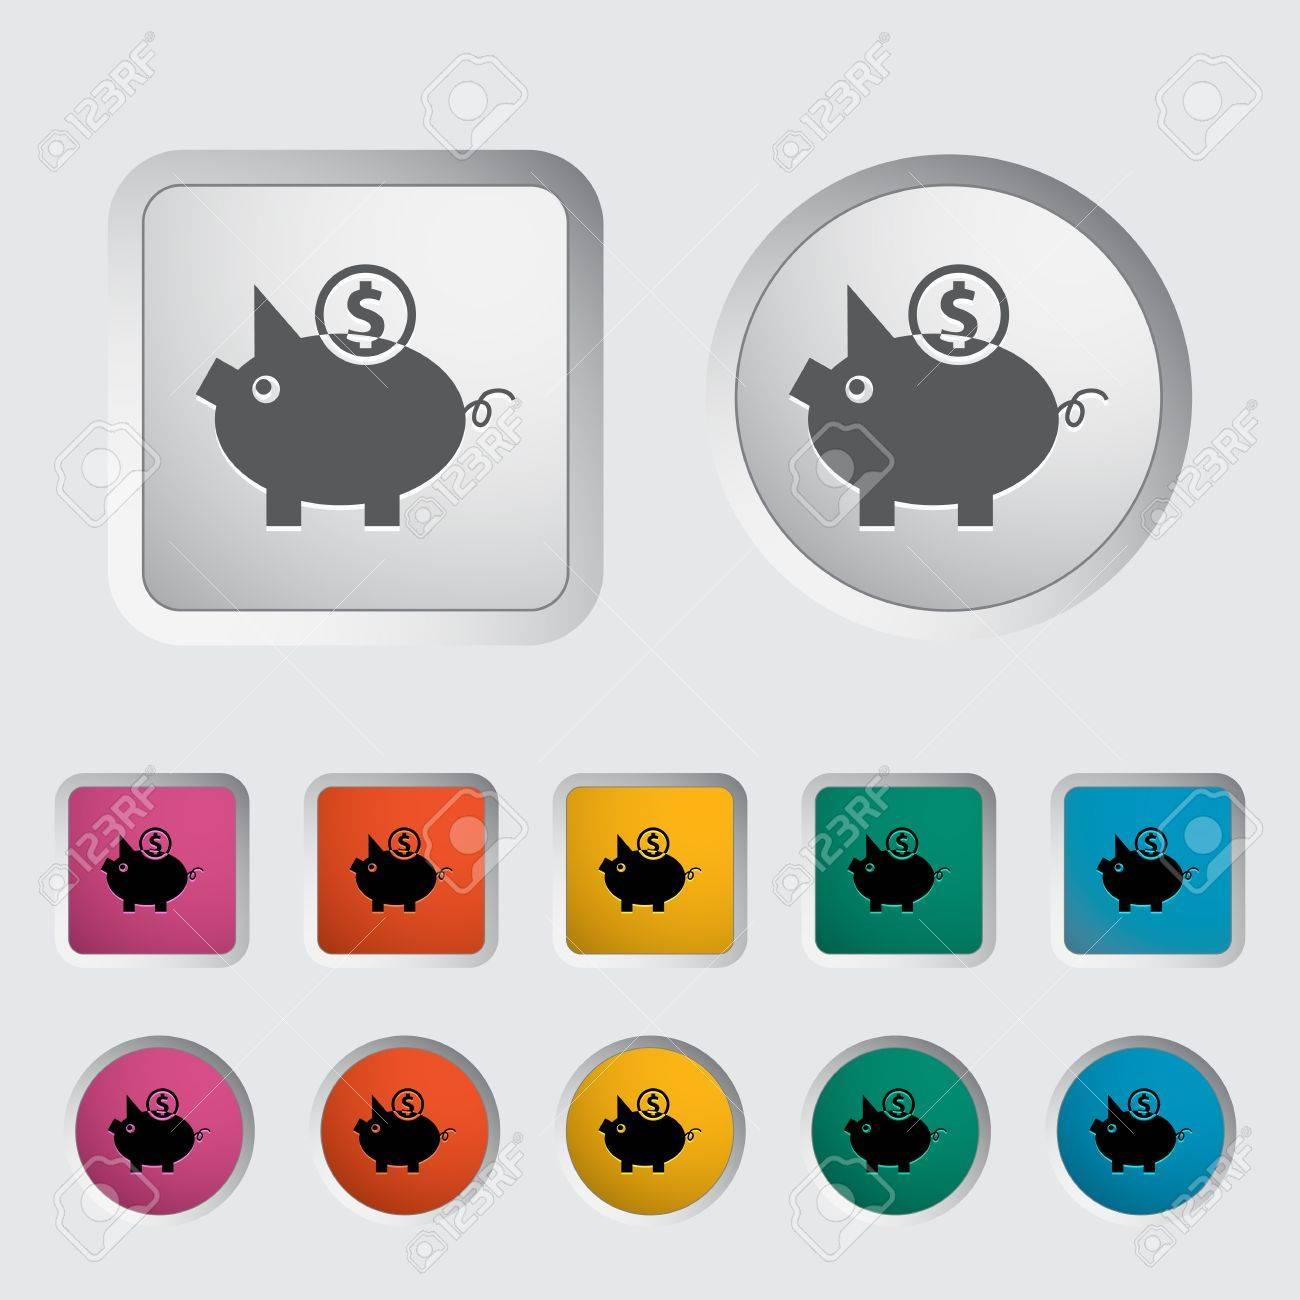 Piggy bank icon. Vector illustration. Stock Vector - 16786963